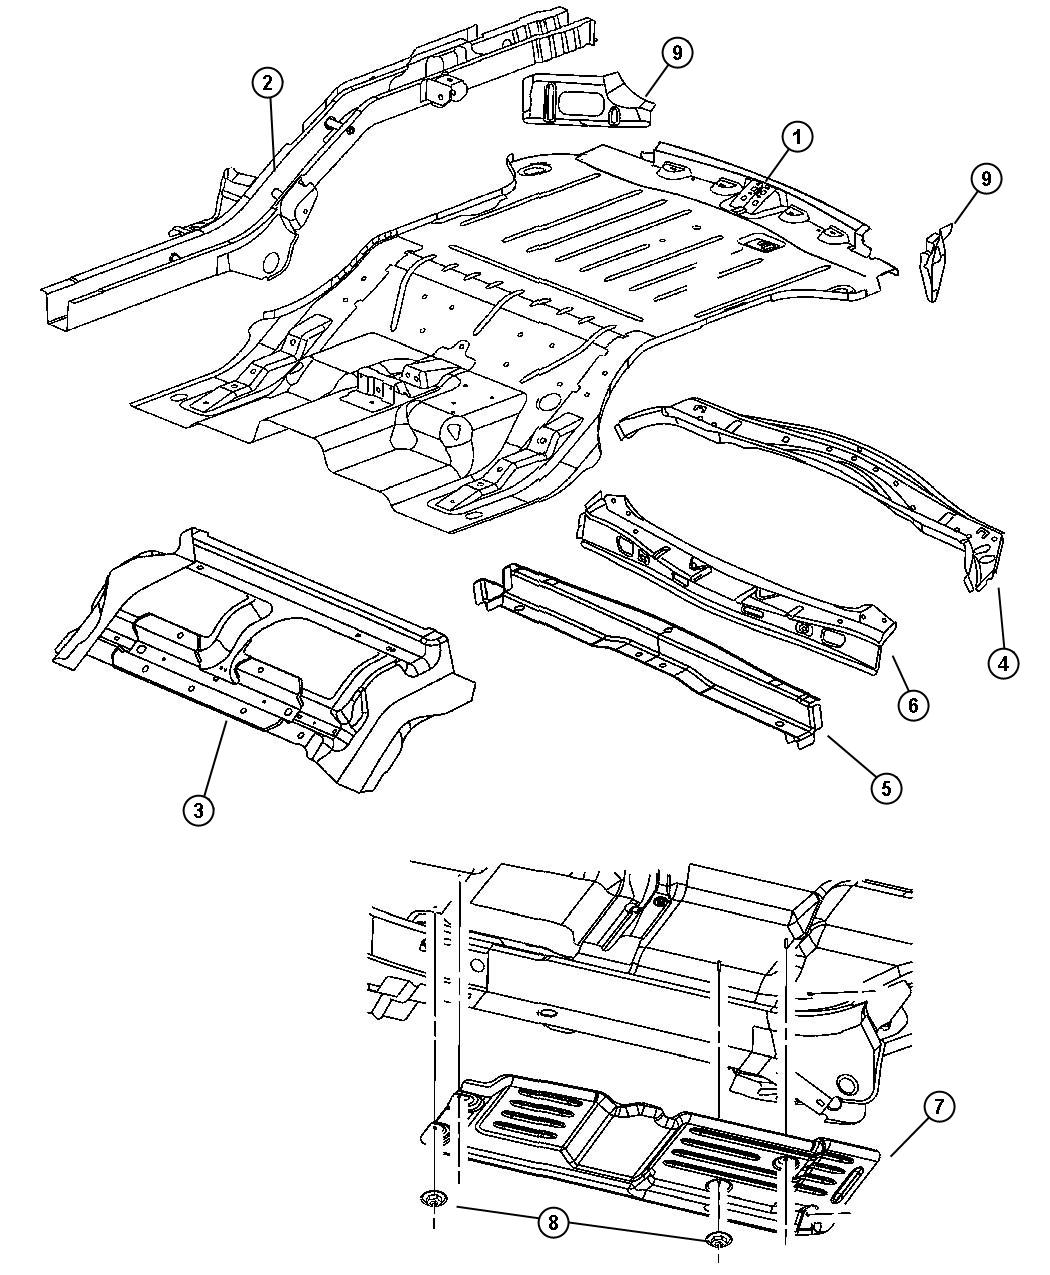 tags: #jeep luggage rack#jeep frame repair plates#jeep transmission  mount#jeep wrangler tj frame#jeep windshield frame#jeep tj rear  differential#jeep tj